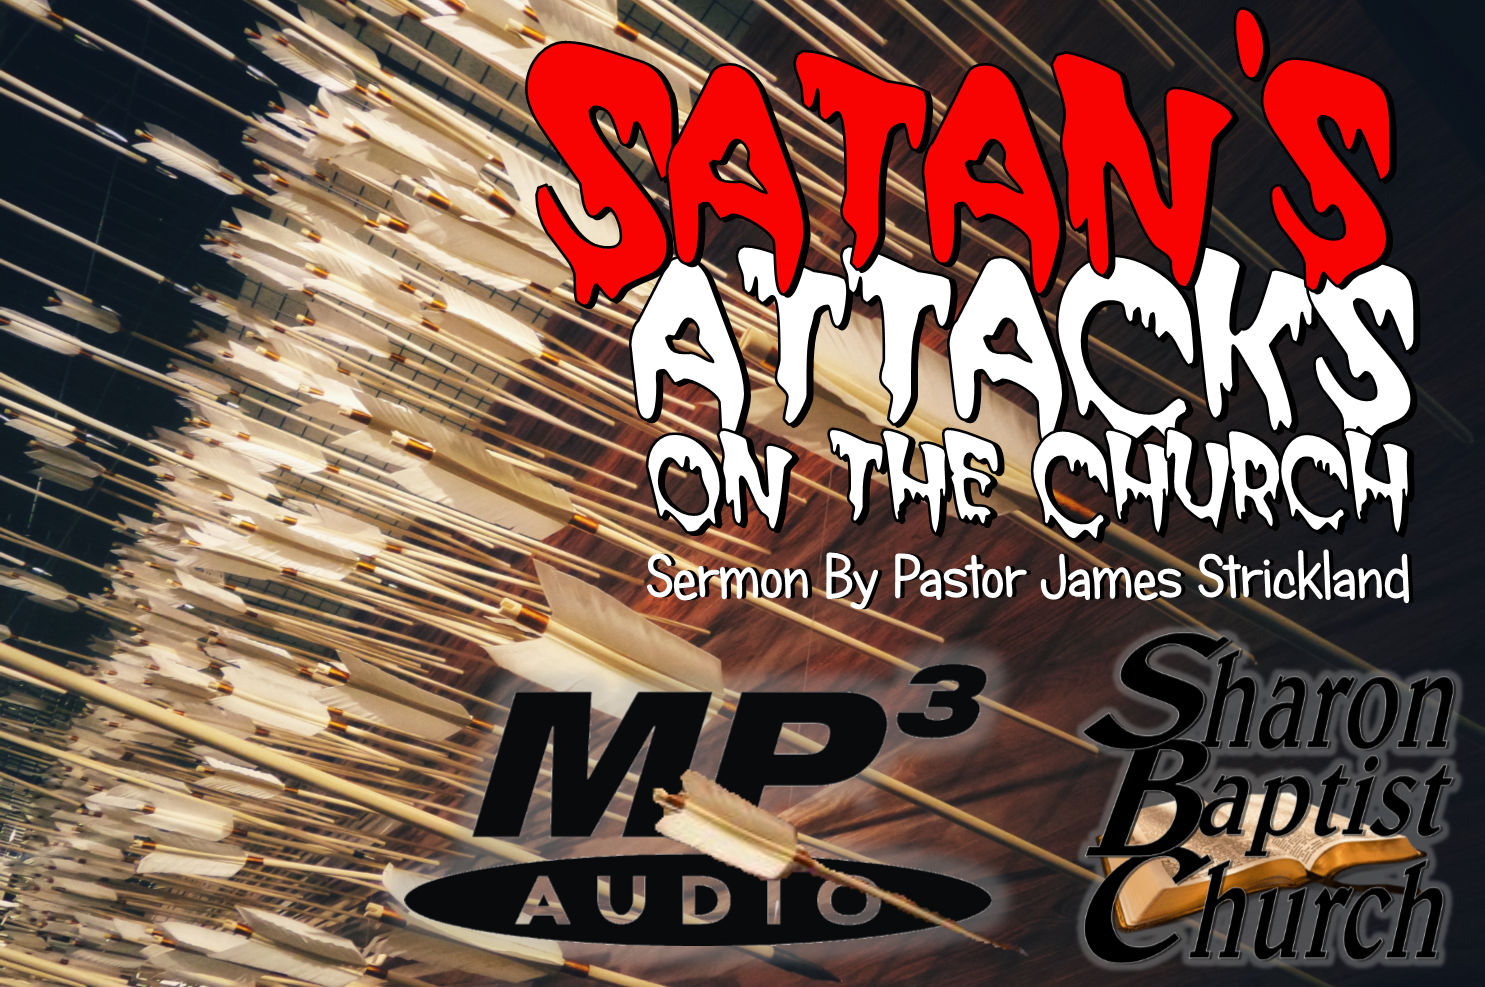 Satans Attacks on the church SERMON AUDIO